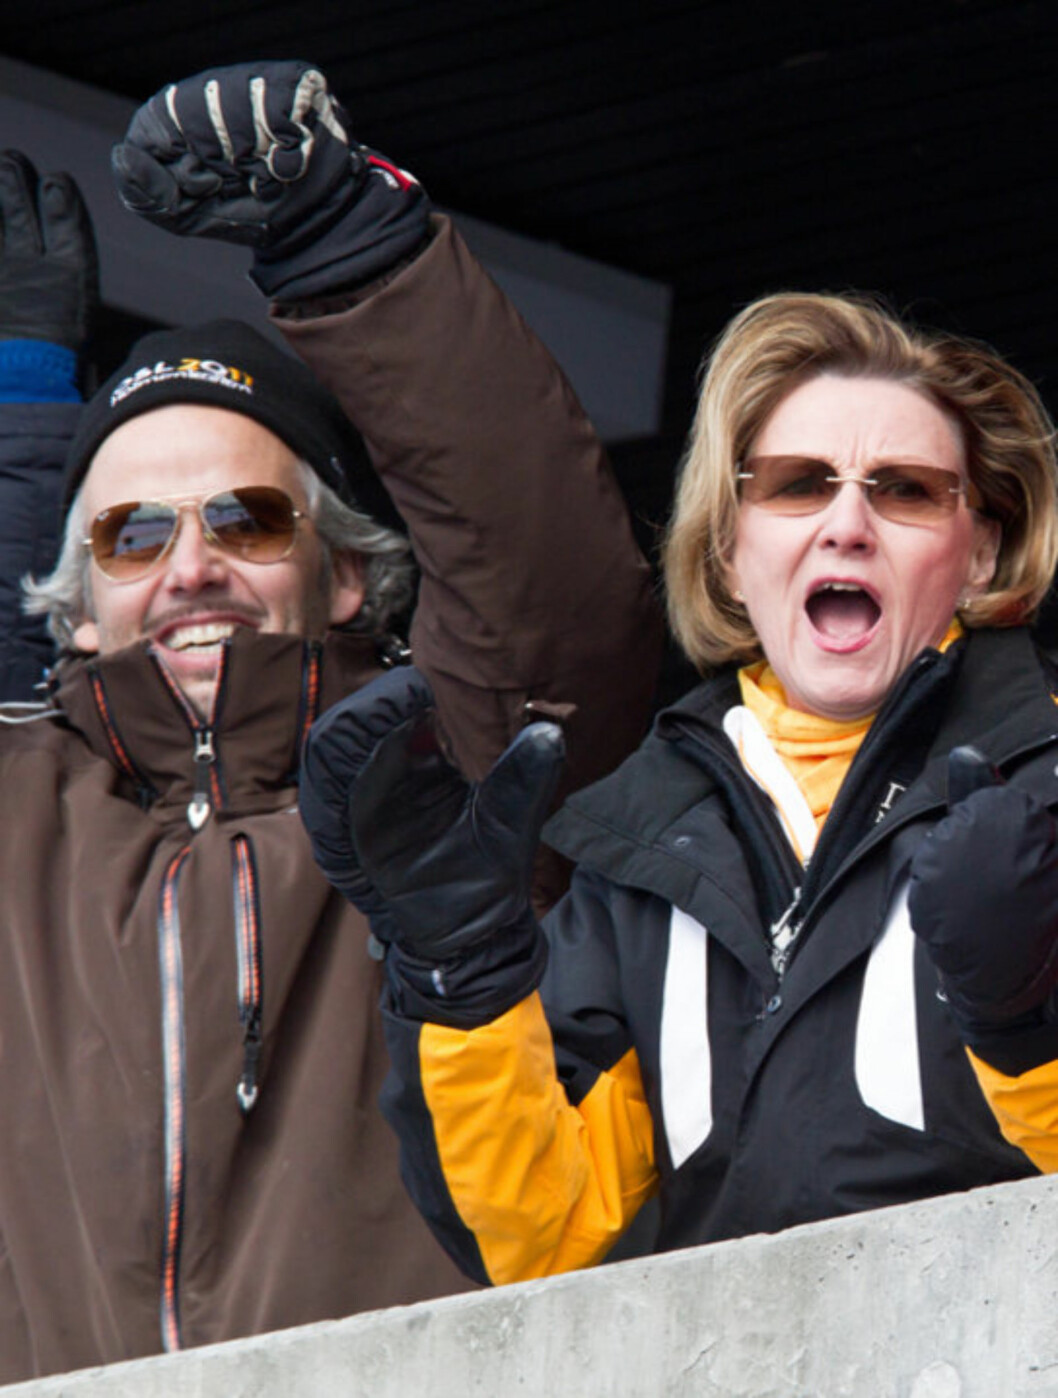 JUBELBRØL: Ari Behn og svigermor dronning Sonja på kongetribunen under Ski-VM i Oslo. Foto: Stella Pictures